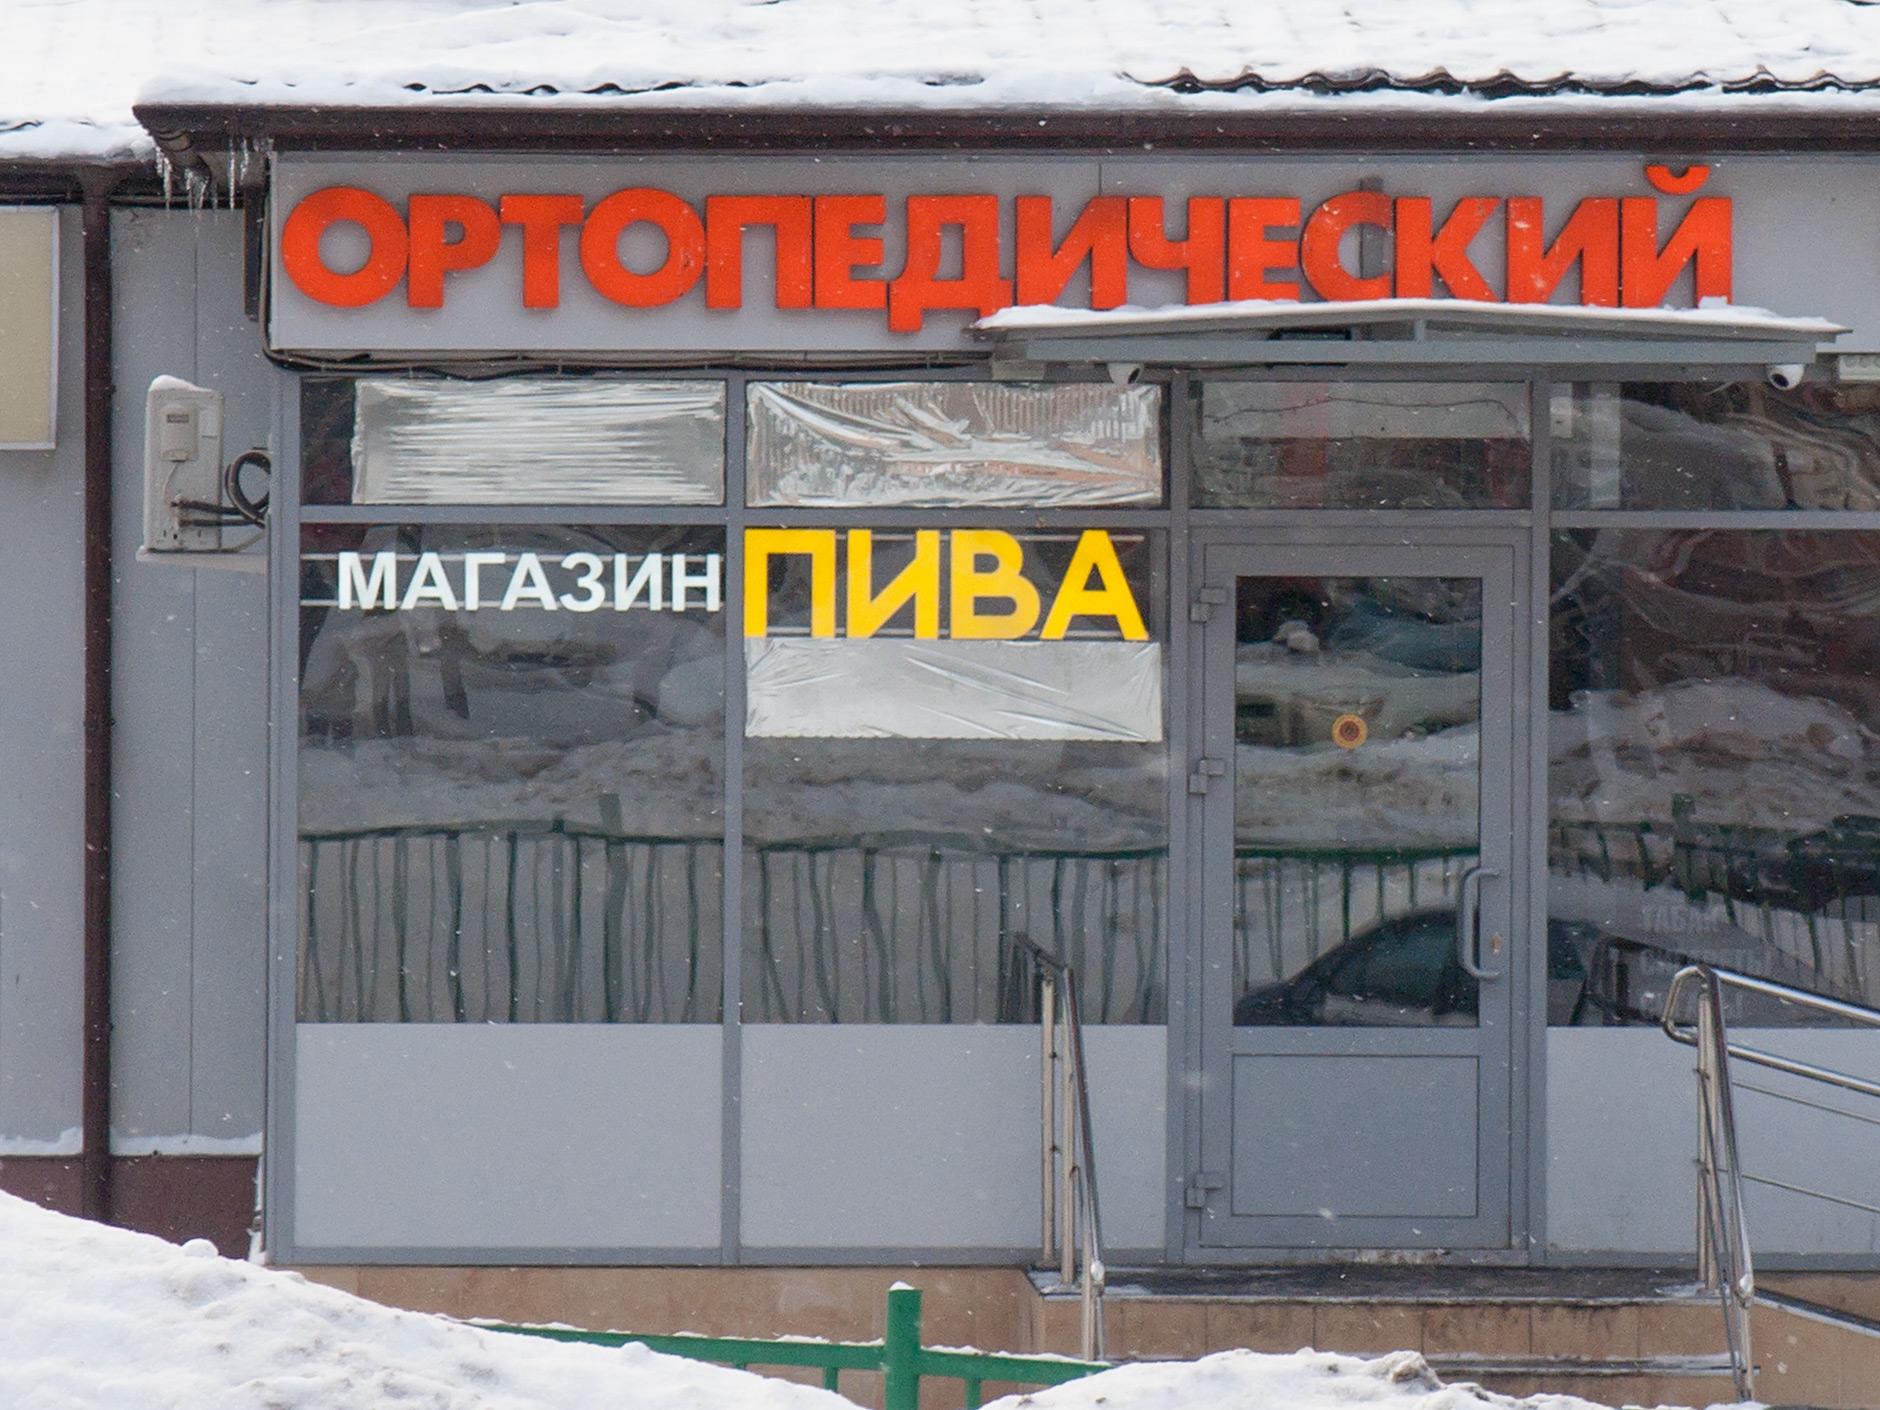 Ортопедический магазин пива